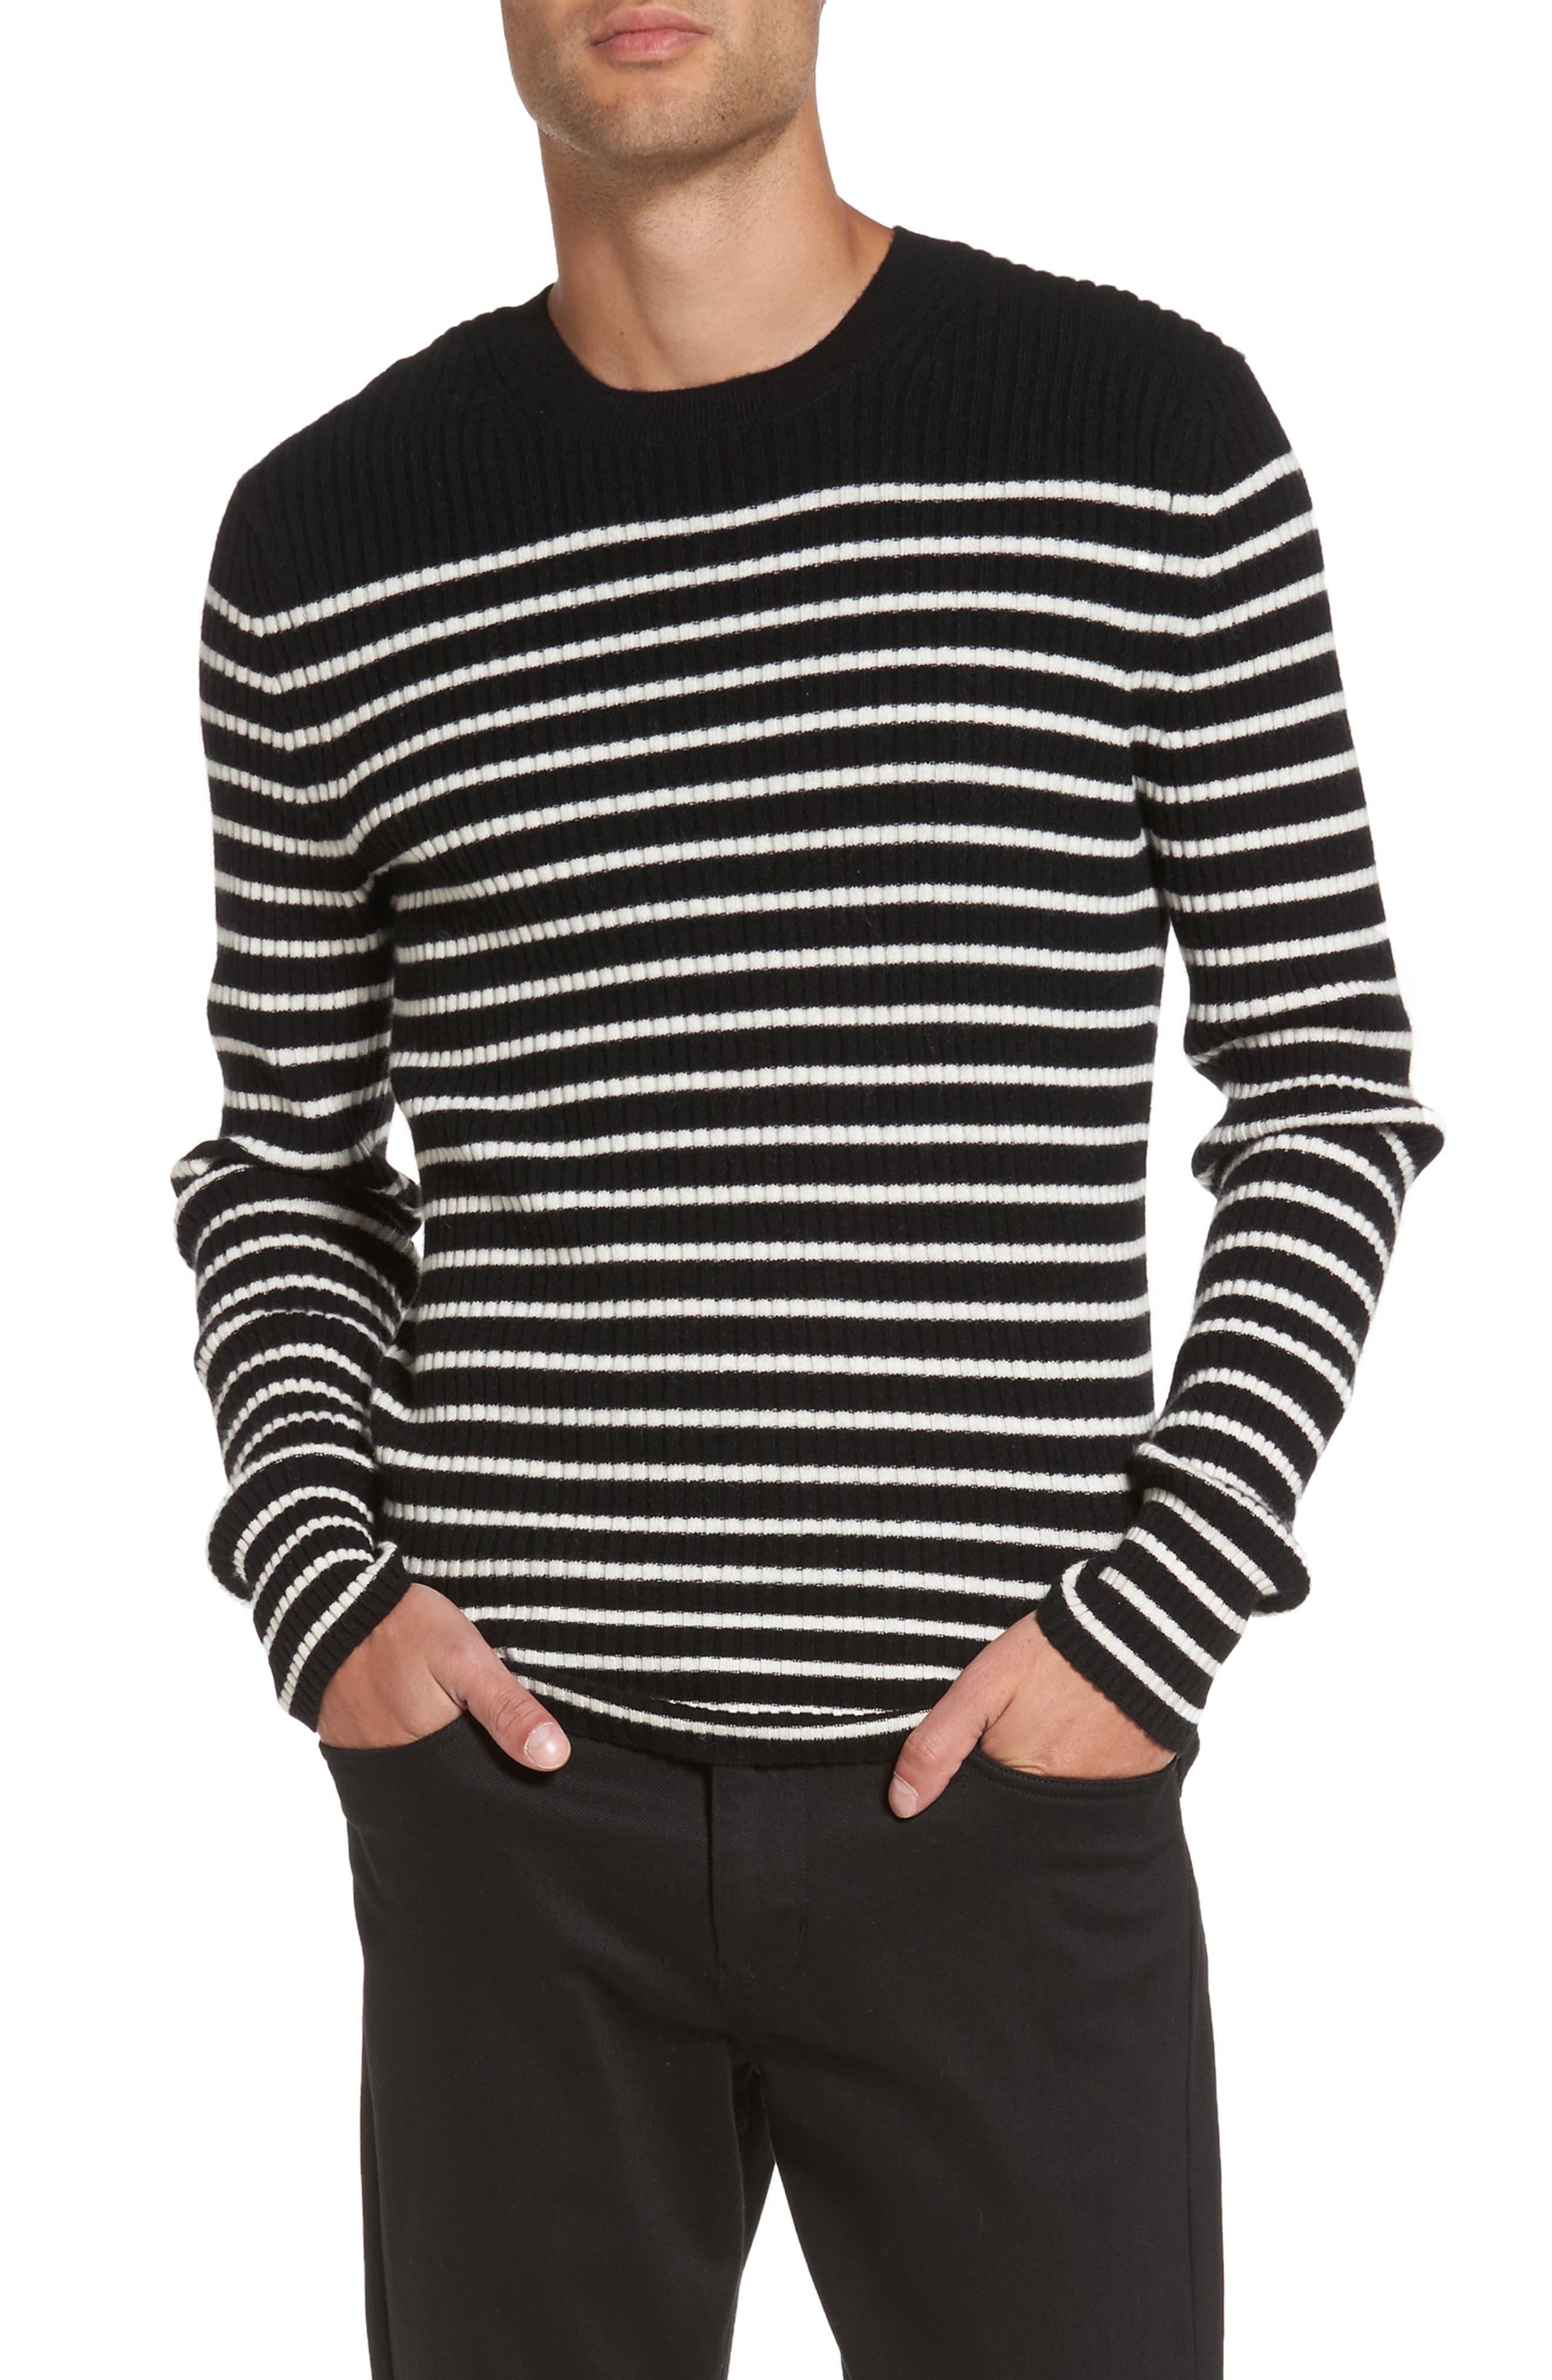 Vince Slim Fit Breton Stripe Cashmere Crewneck Sweater | Nordstrom